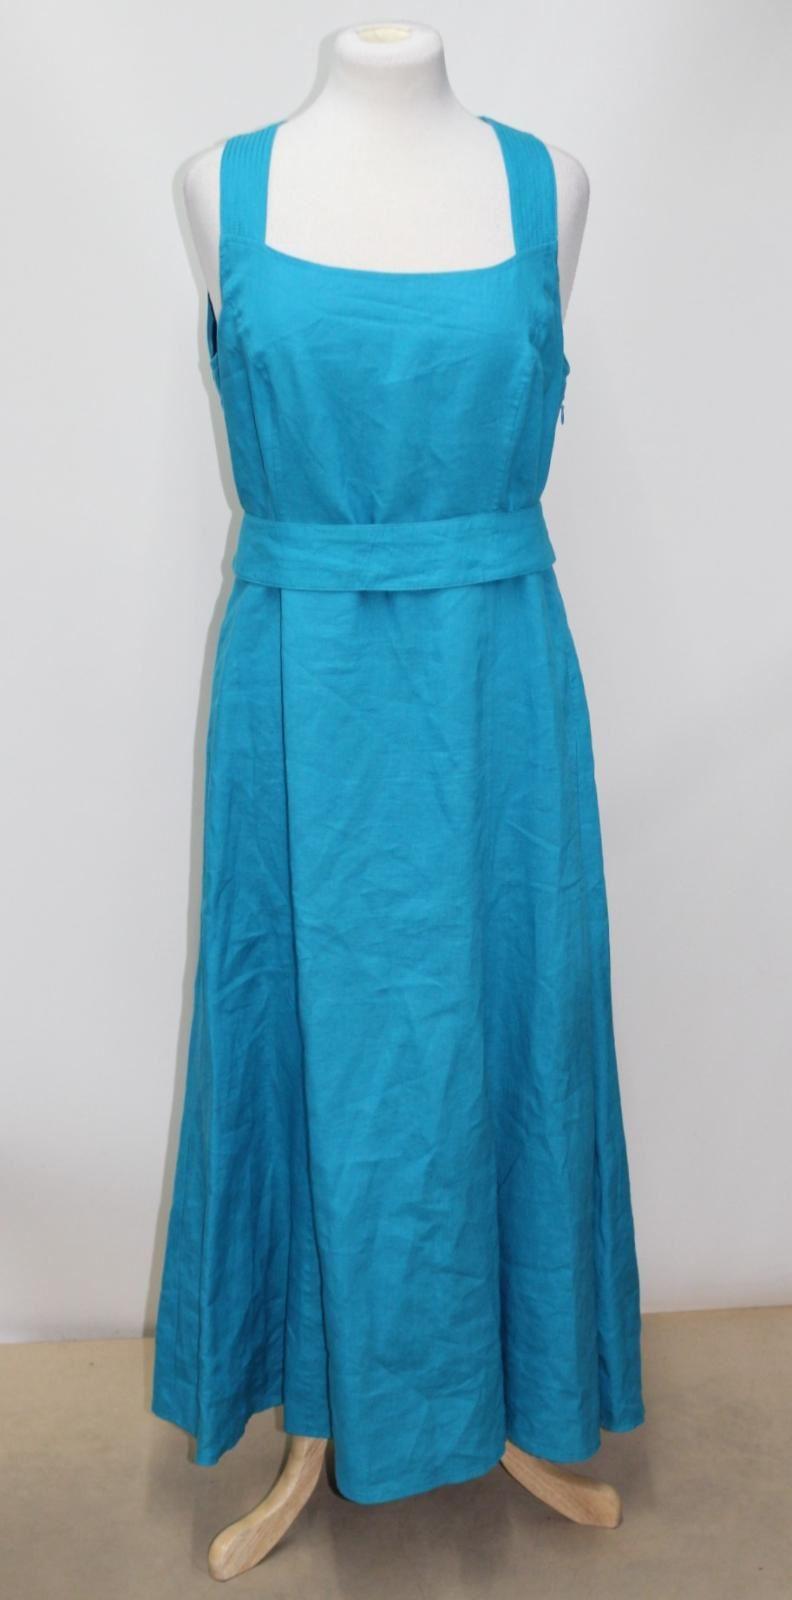 WINDSMOOR-Ladies-Turquoise-Blue-Linen-A-Line-Maxi-Long-Dress-Size-UK12-EU38